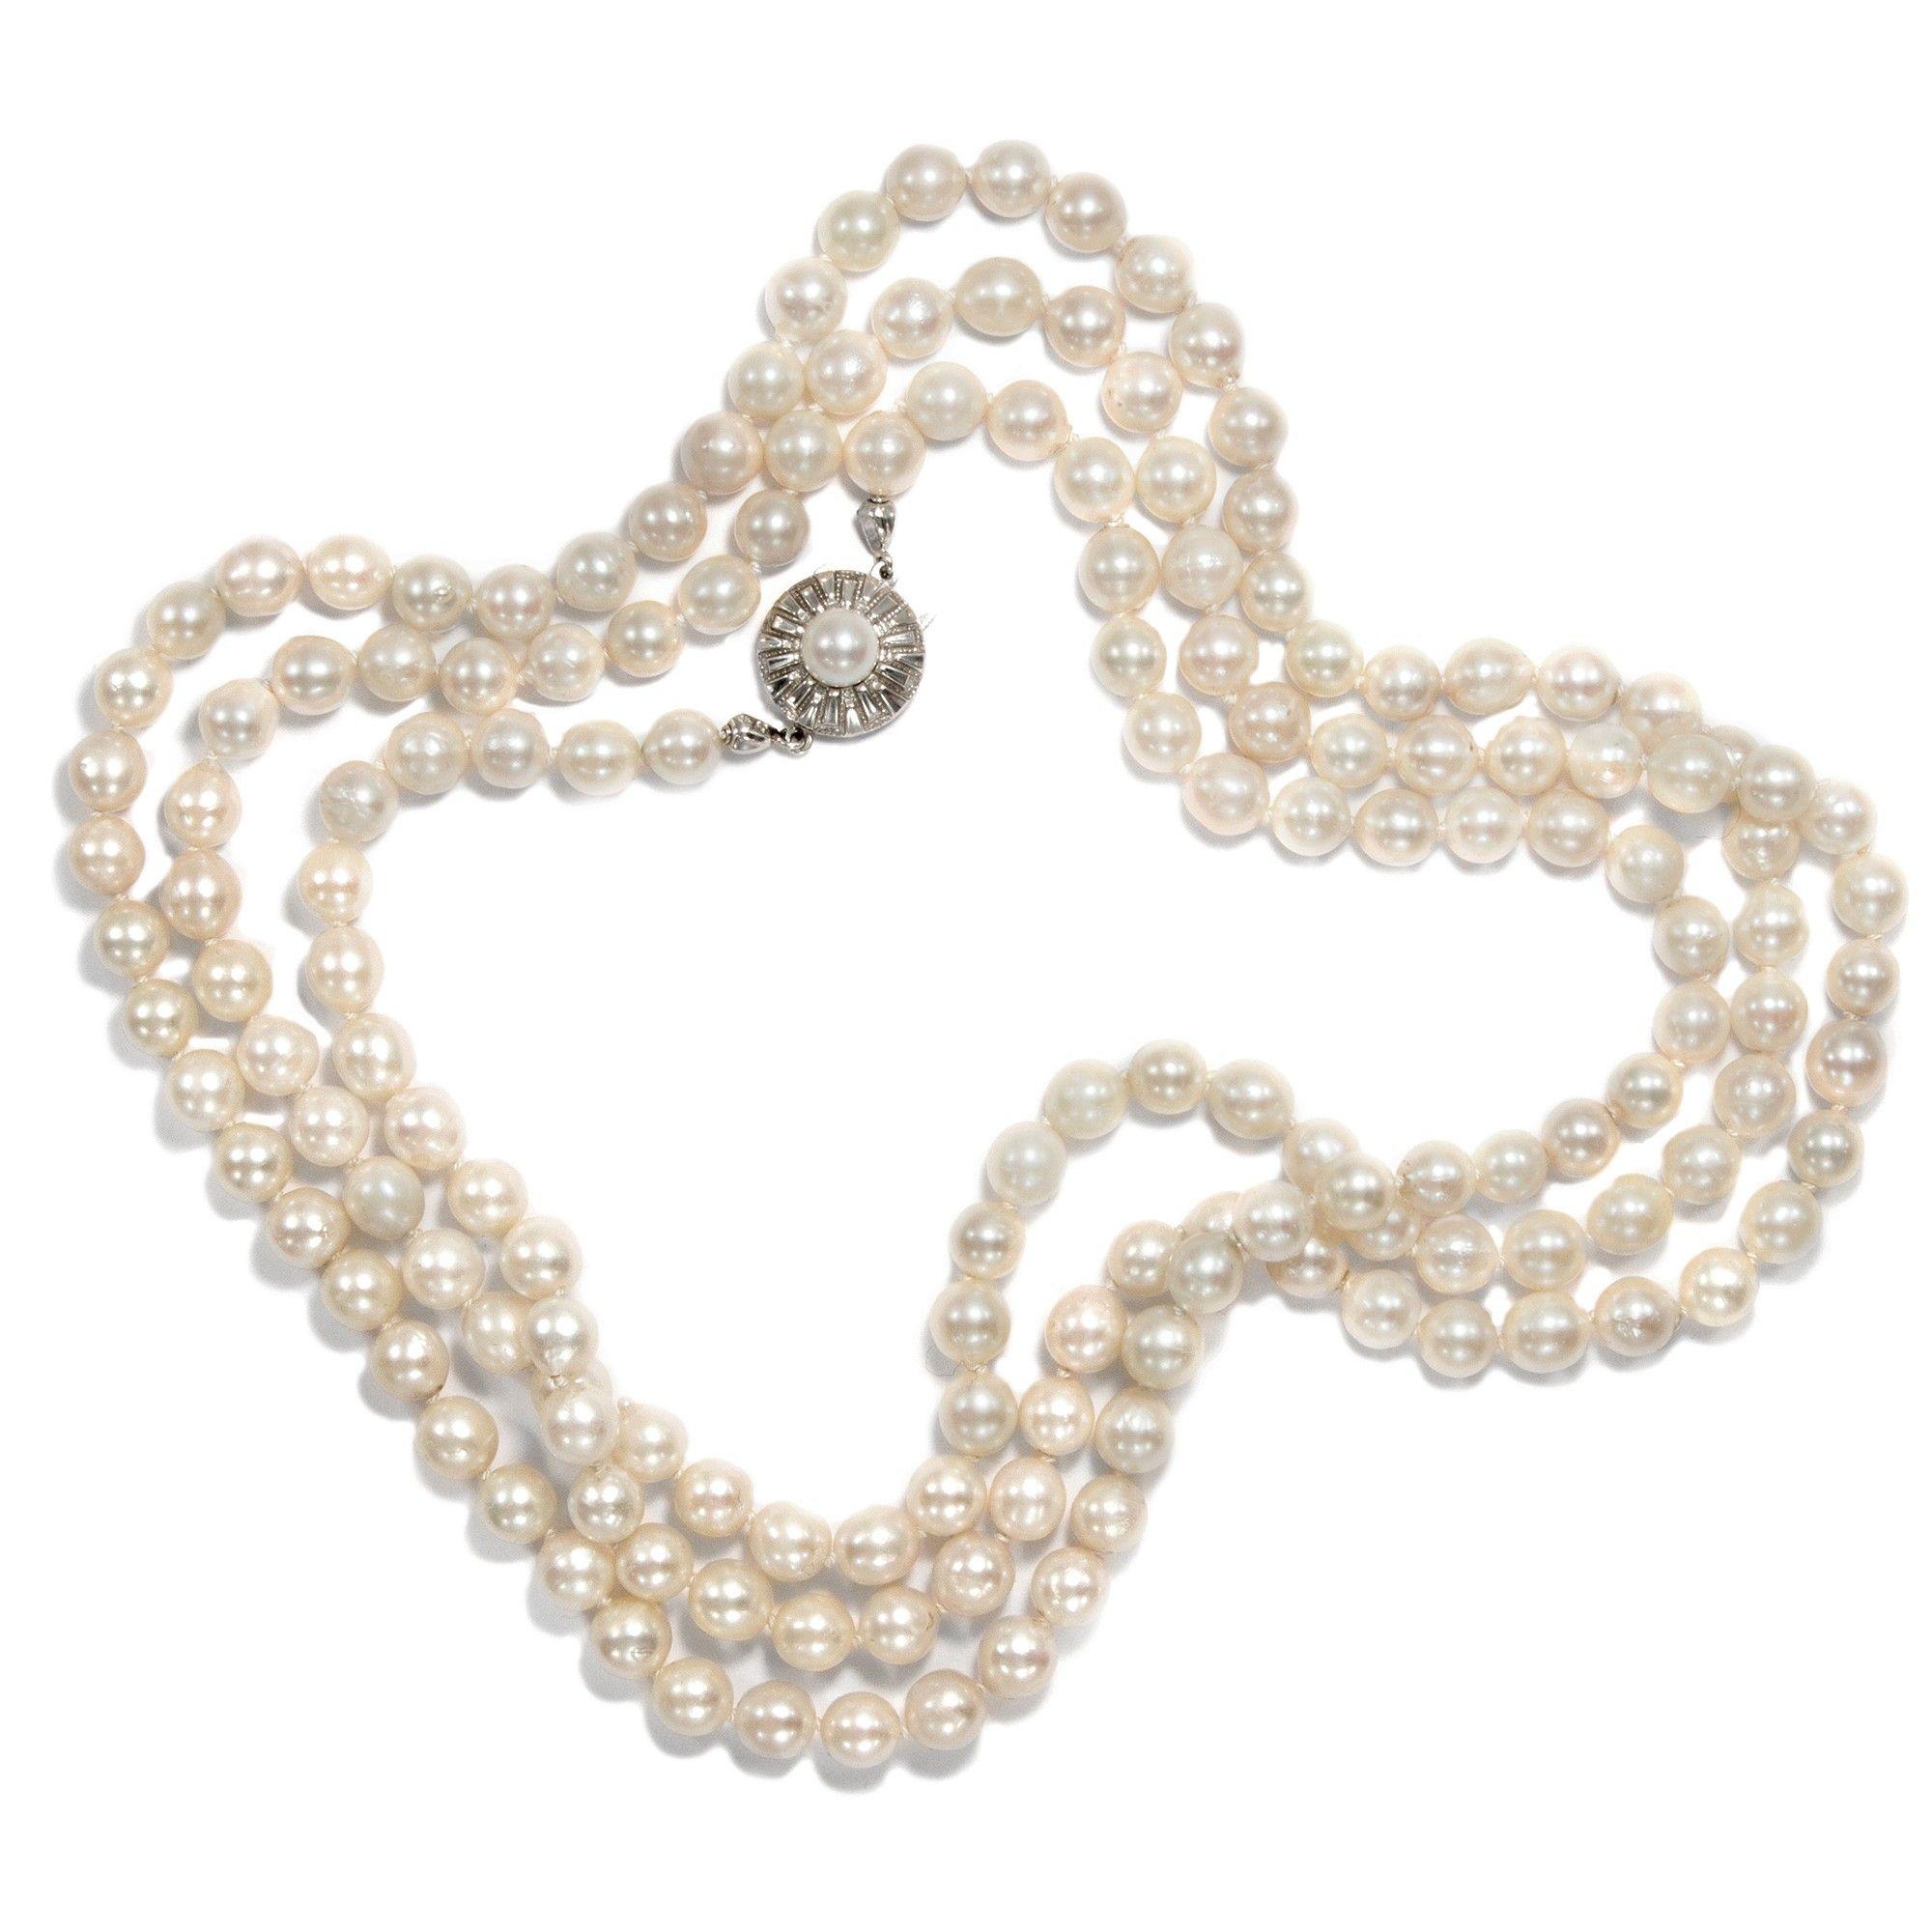 Antik schmuck perlenkette